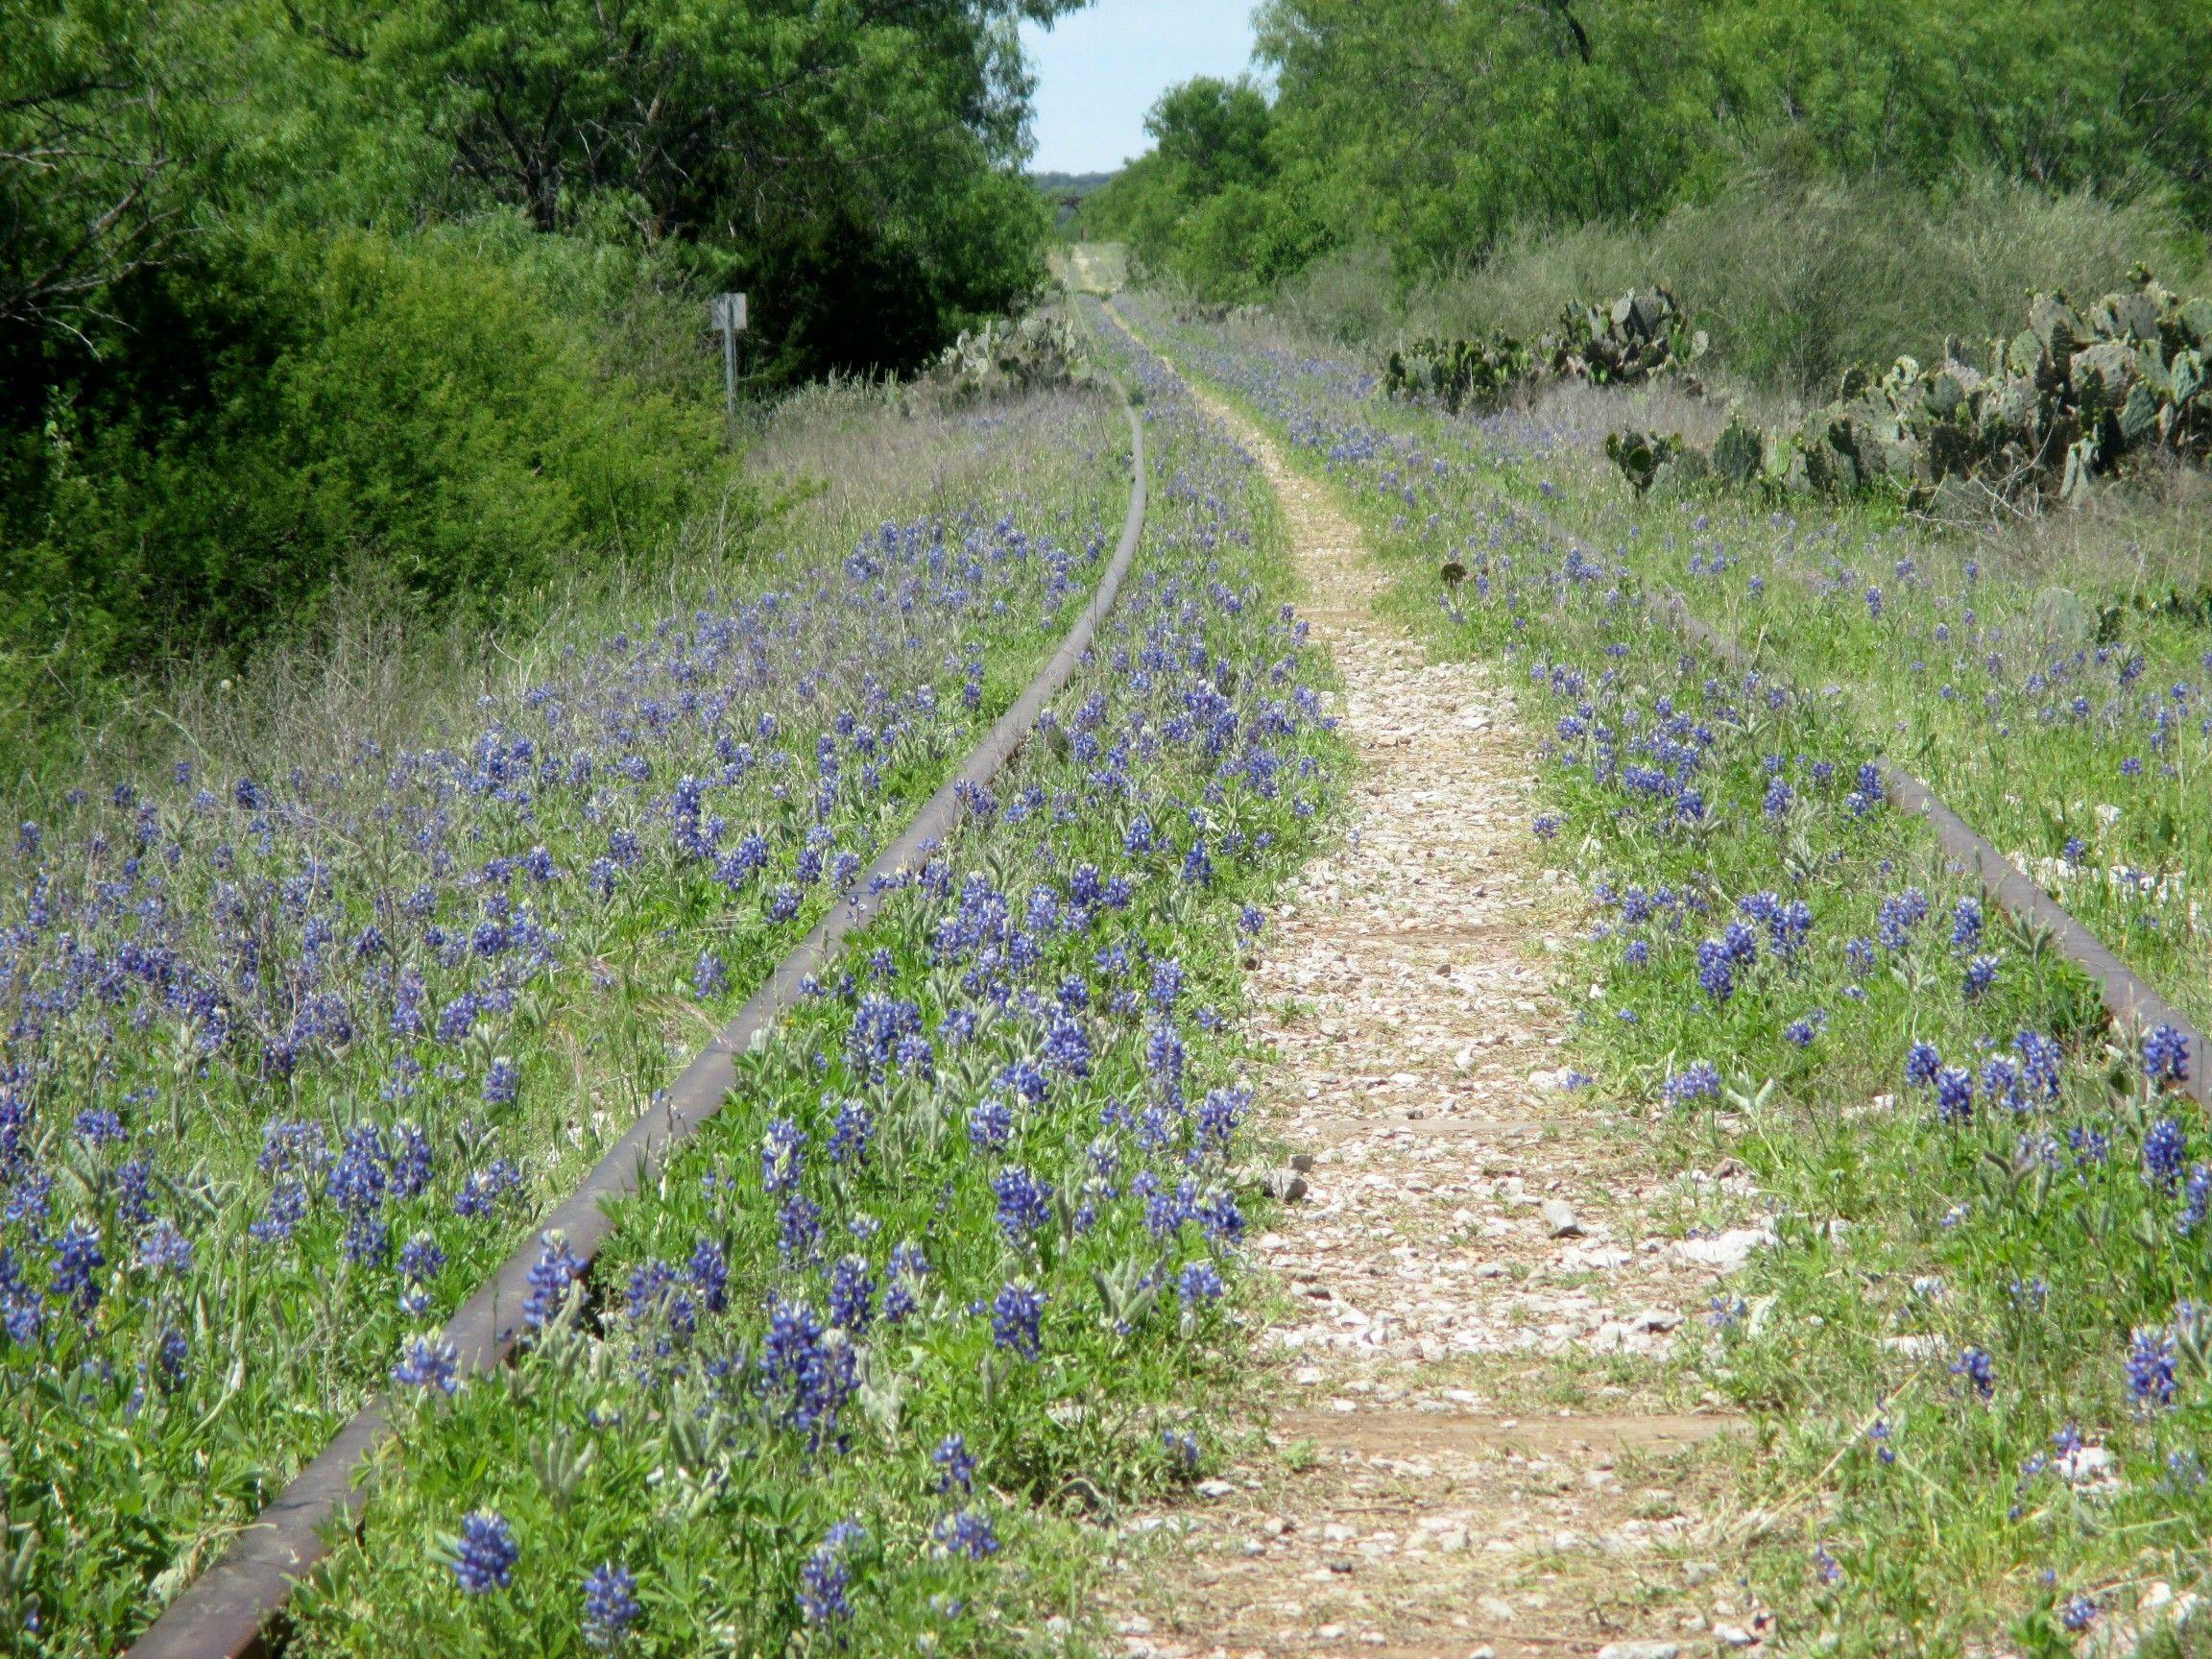 Bluebonnets Thrive Along An Abandoned Rail Line Nears Kingsland TX Richard S Buse Photo